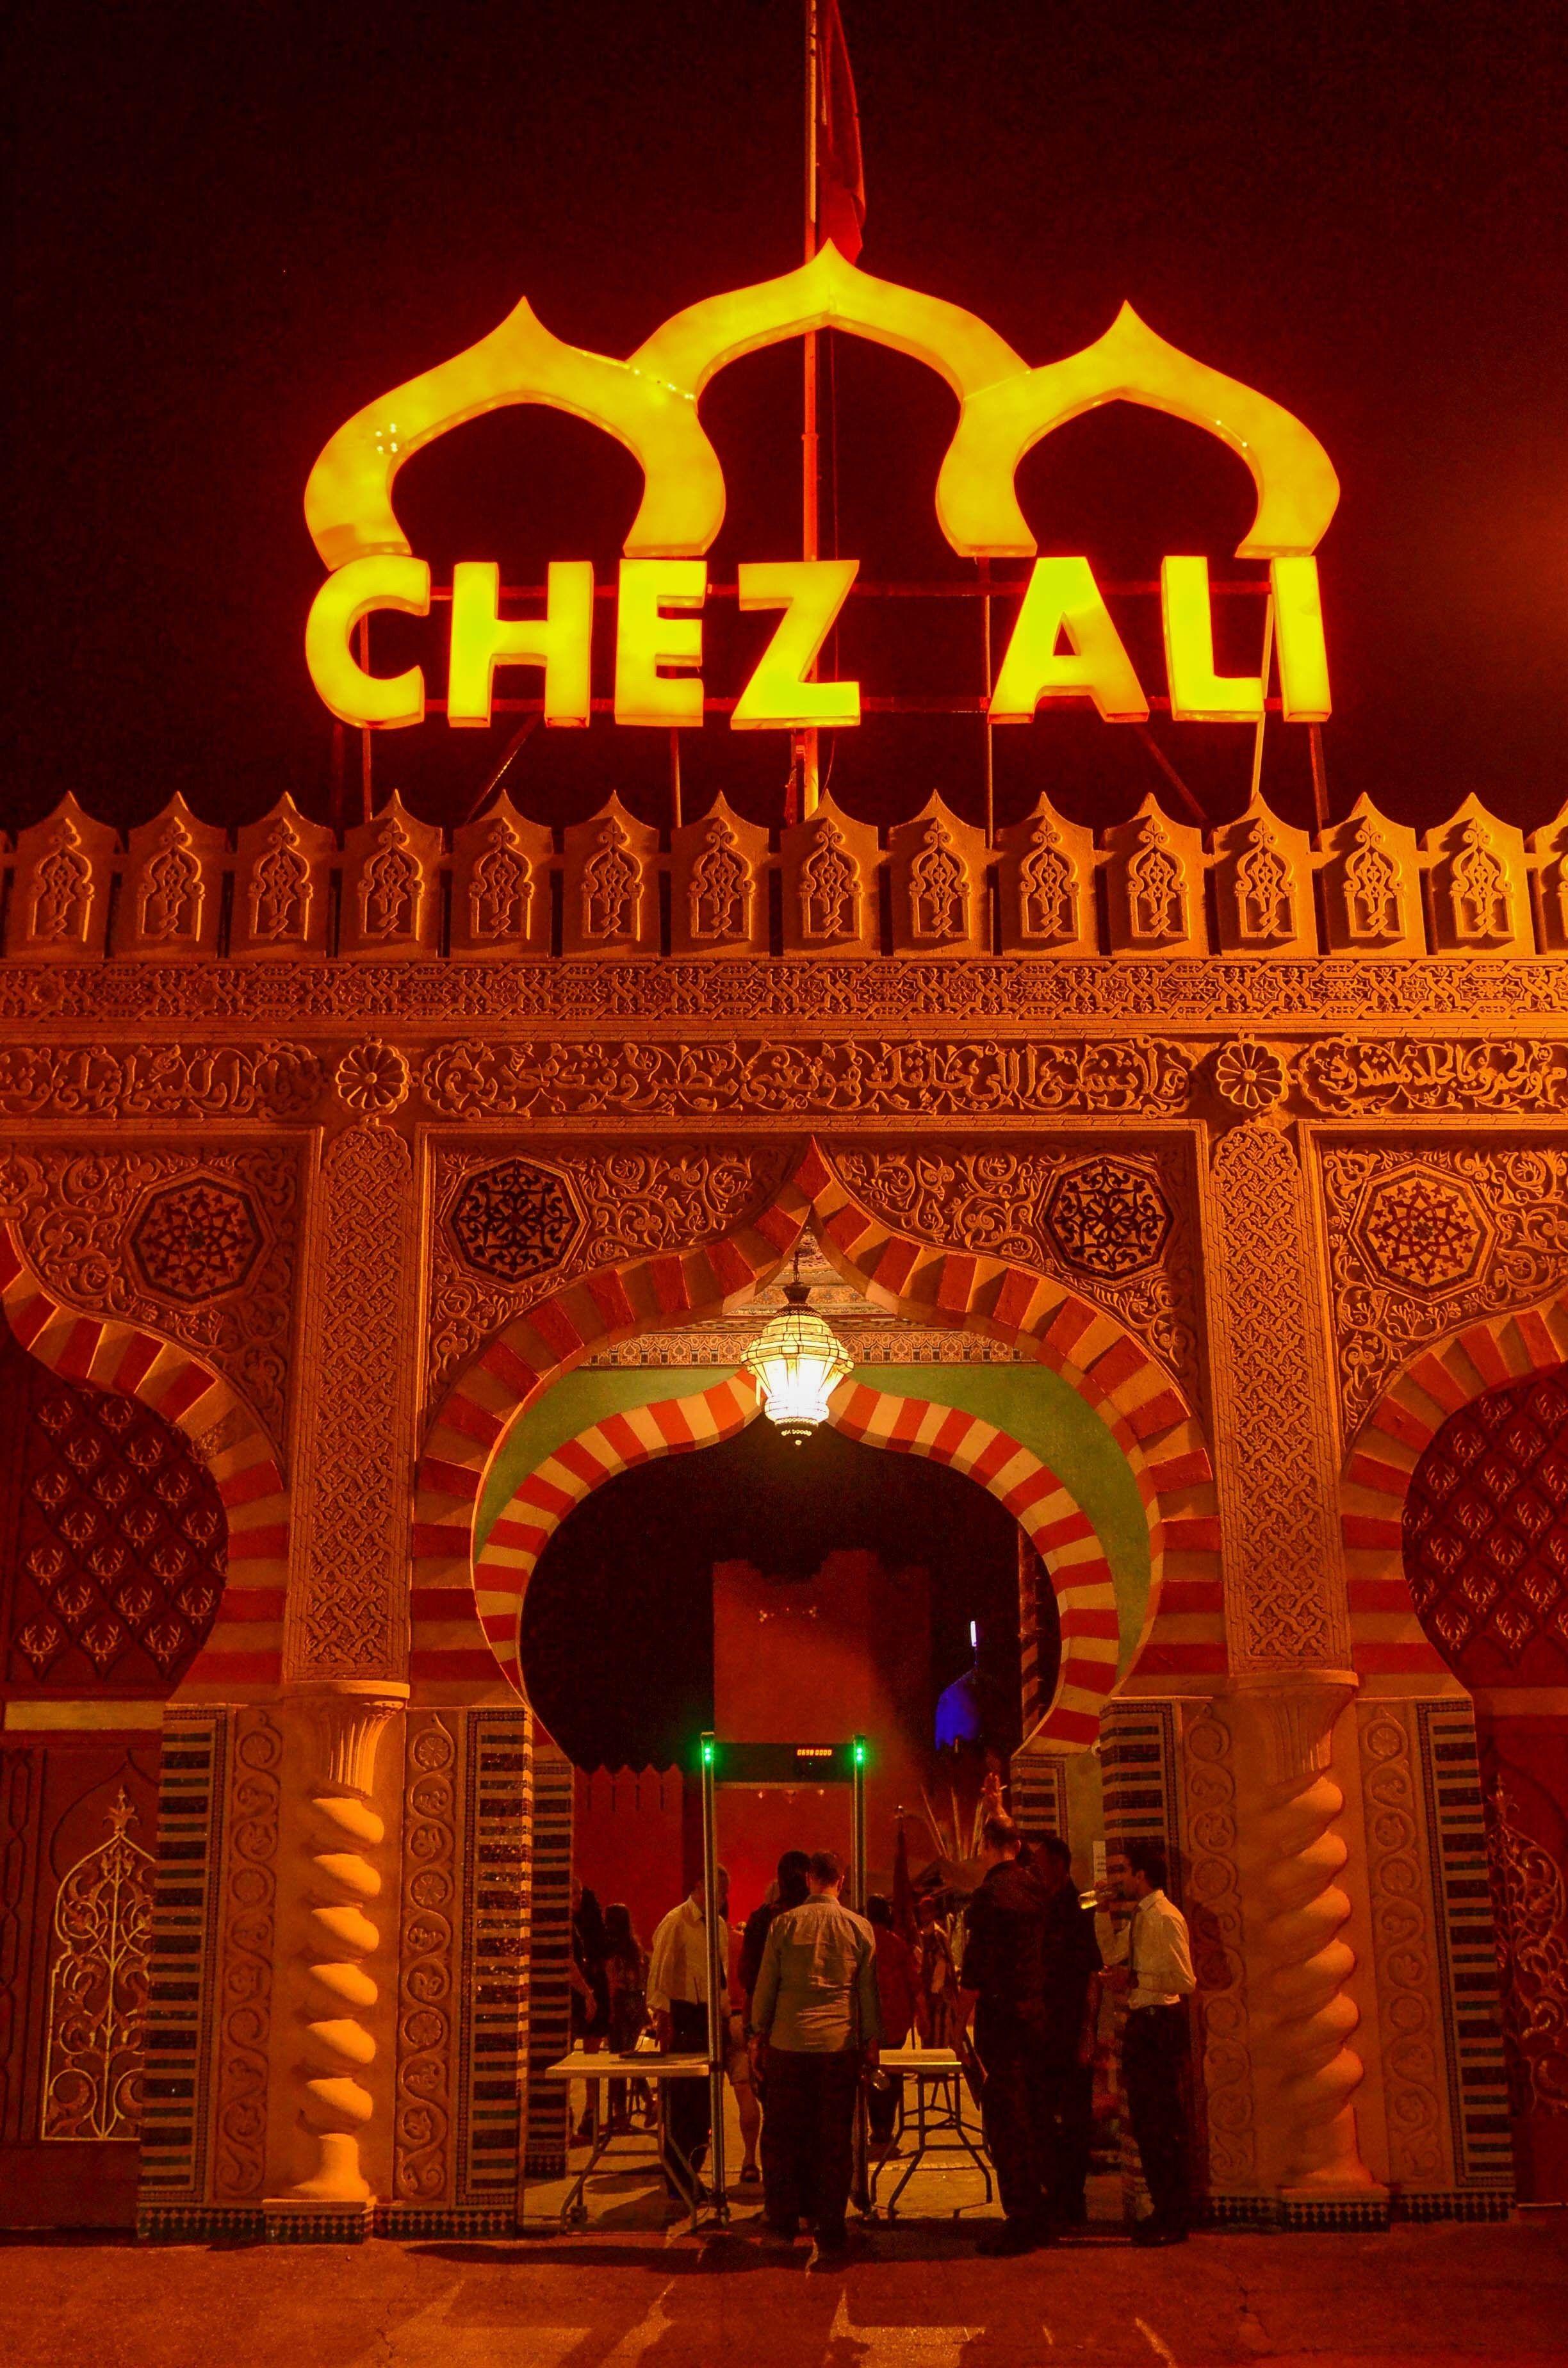 Chez Ali Fantasia Show